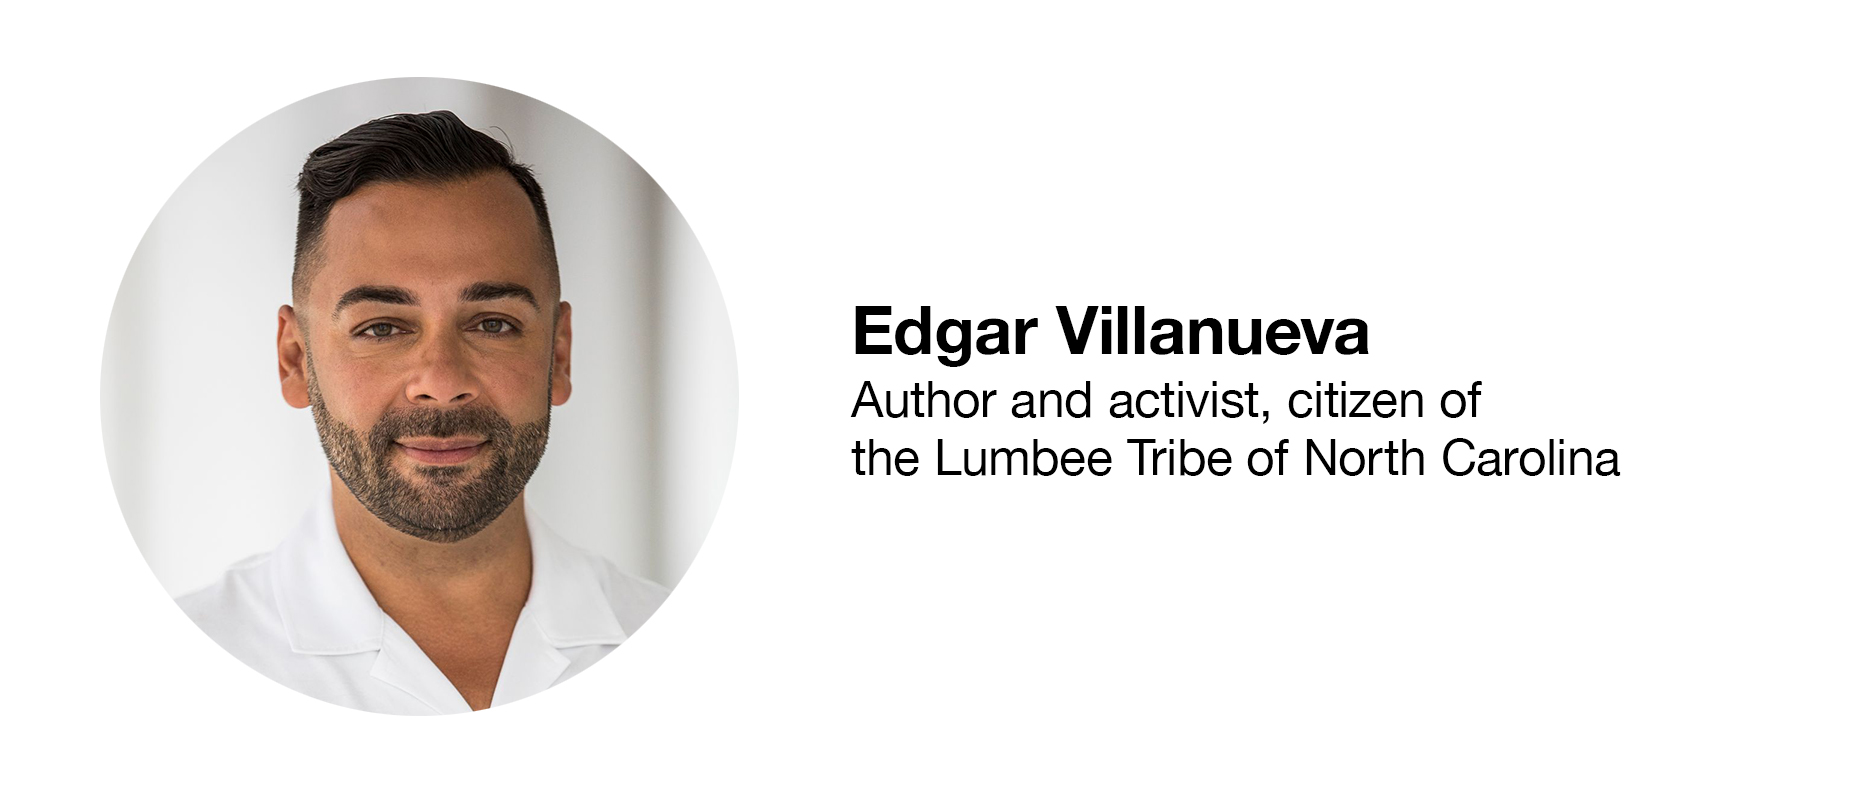 Edgar Villanueva Author and activist, citizen of the Lumbee Tribe of North Carolina